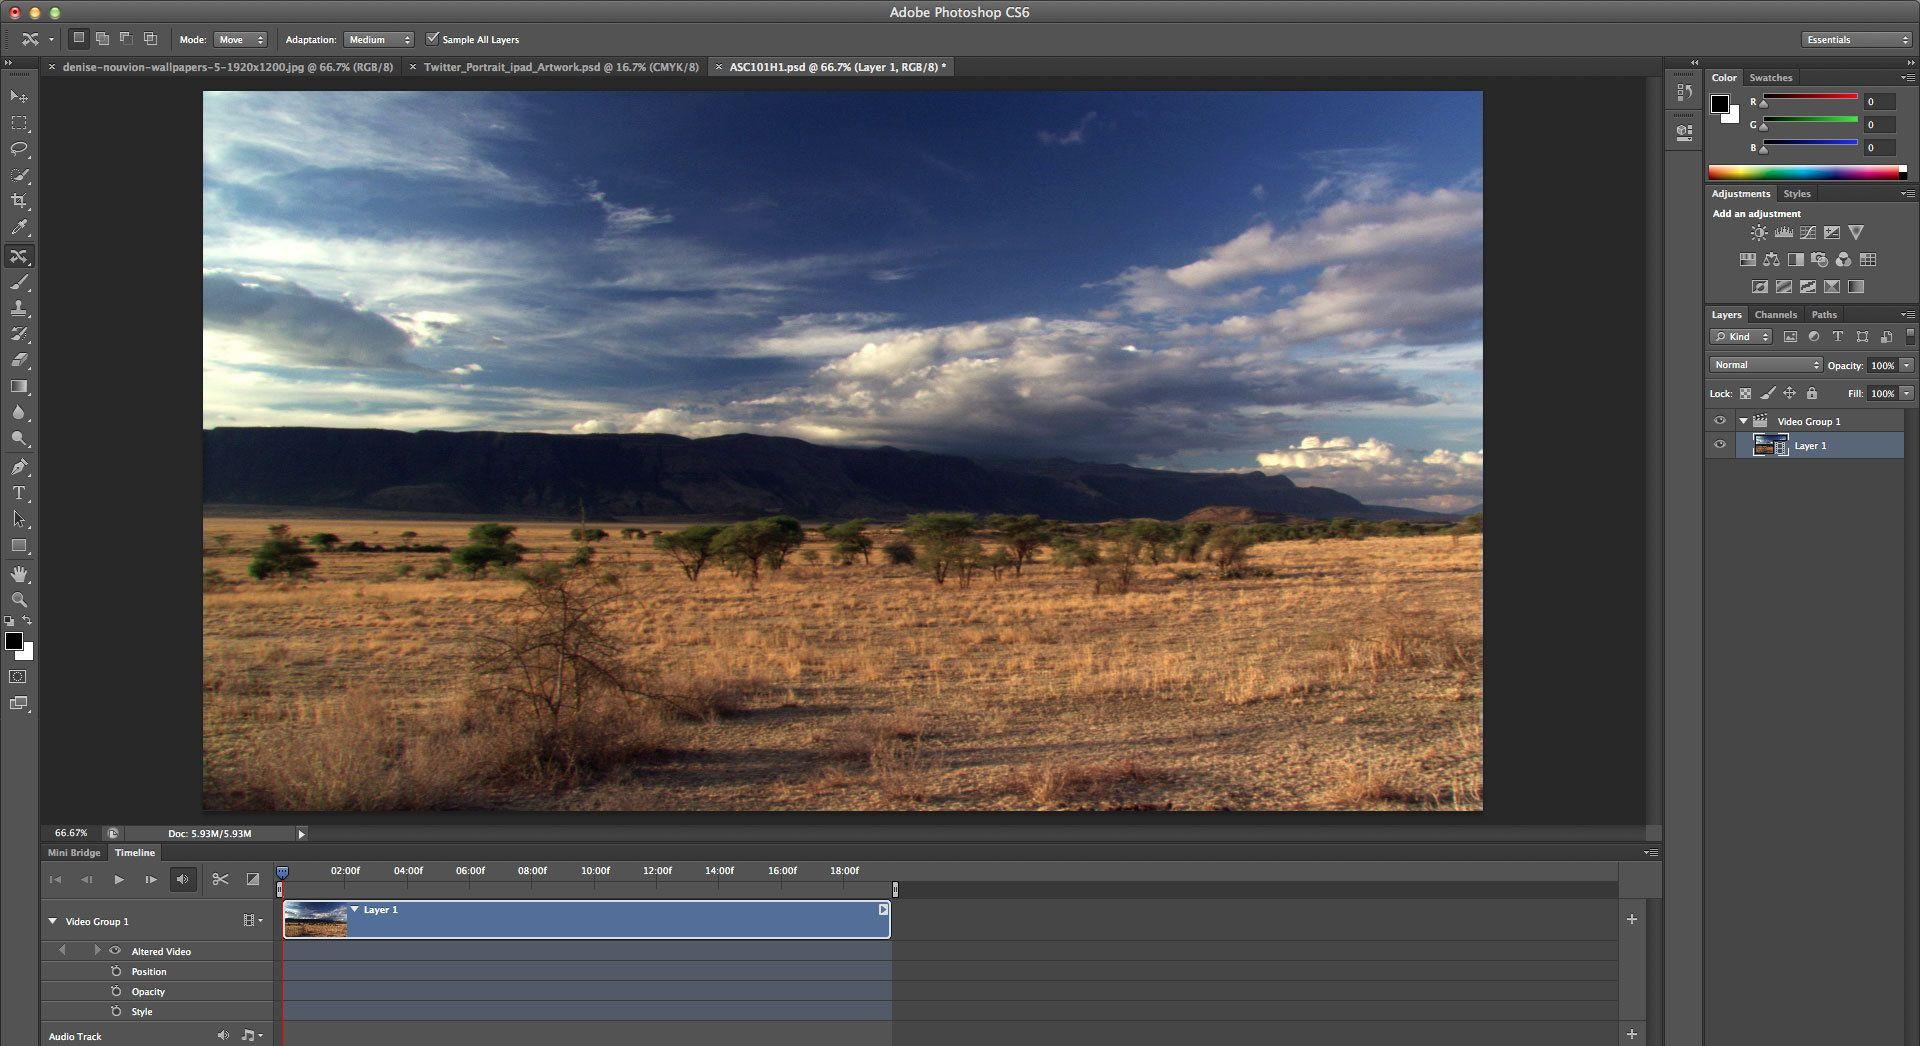 adobe photoshop cs6 video editing